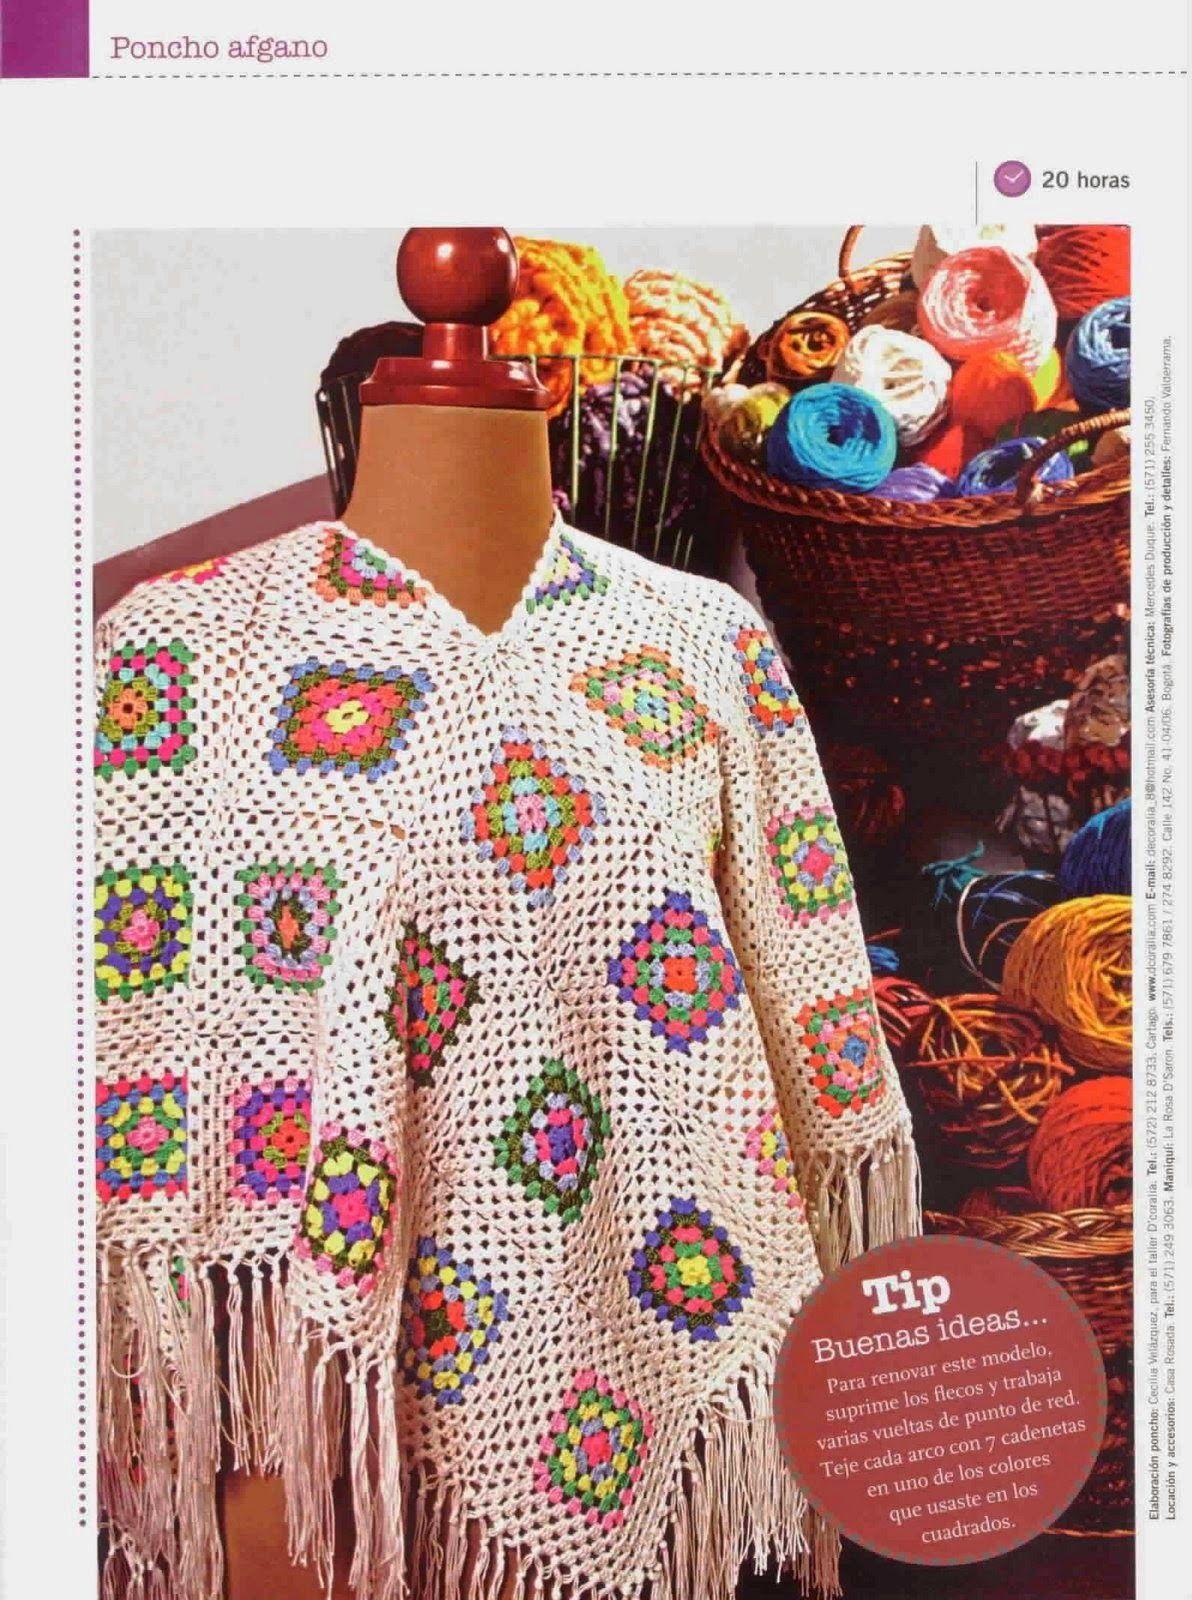 Patrones de Poncho afgano al crochet | Crochet granny | Pinterest ...